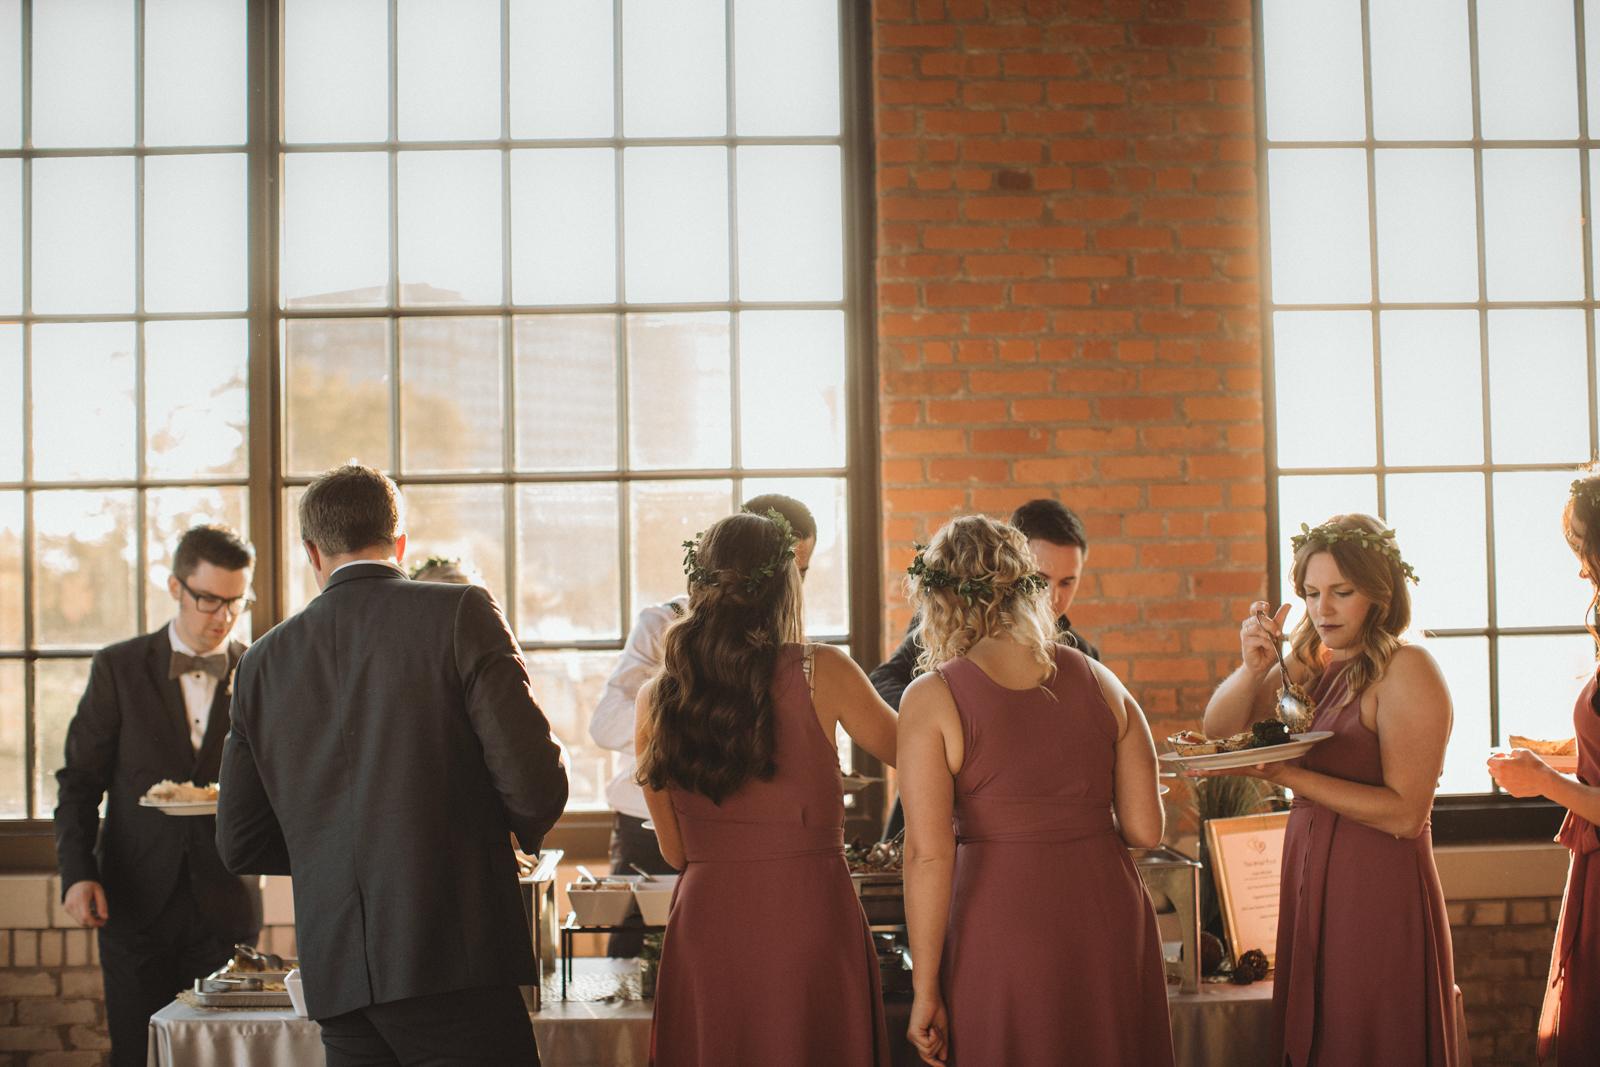 BeanandCole.com-Chris&JackieJohnson-Wedding-100.jpg